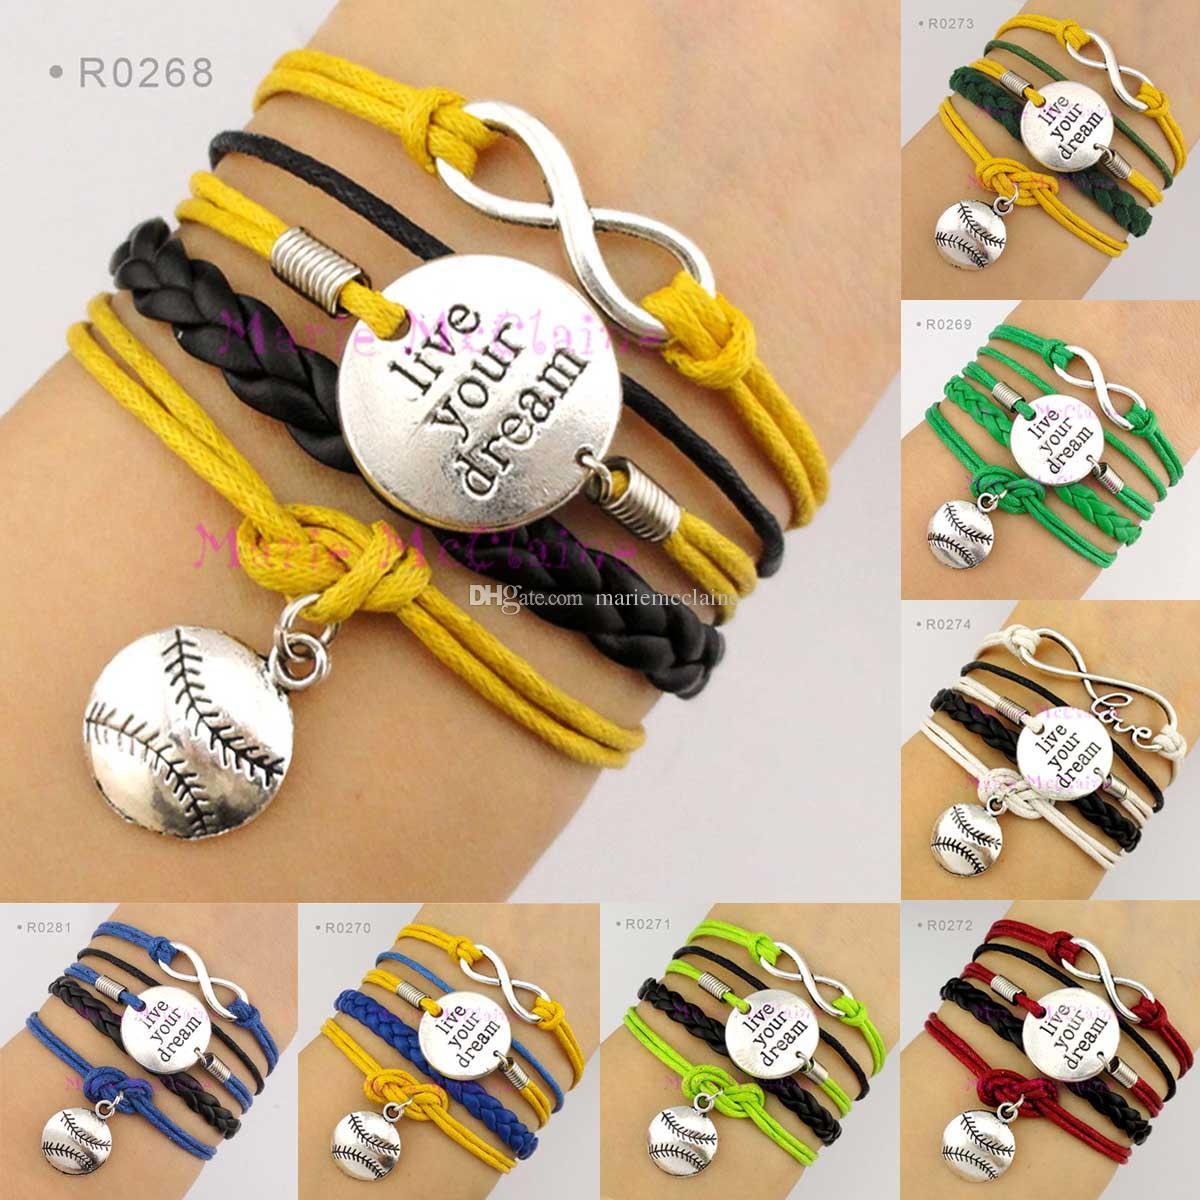 Live Your Dream Infinity Wish Love Baseball Softball Charm Sports Wrap  Bracelets Leather Wax Unisex Women Fashion Christmas Custom Design Charm  Bracelets Uk